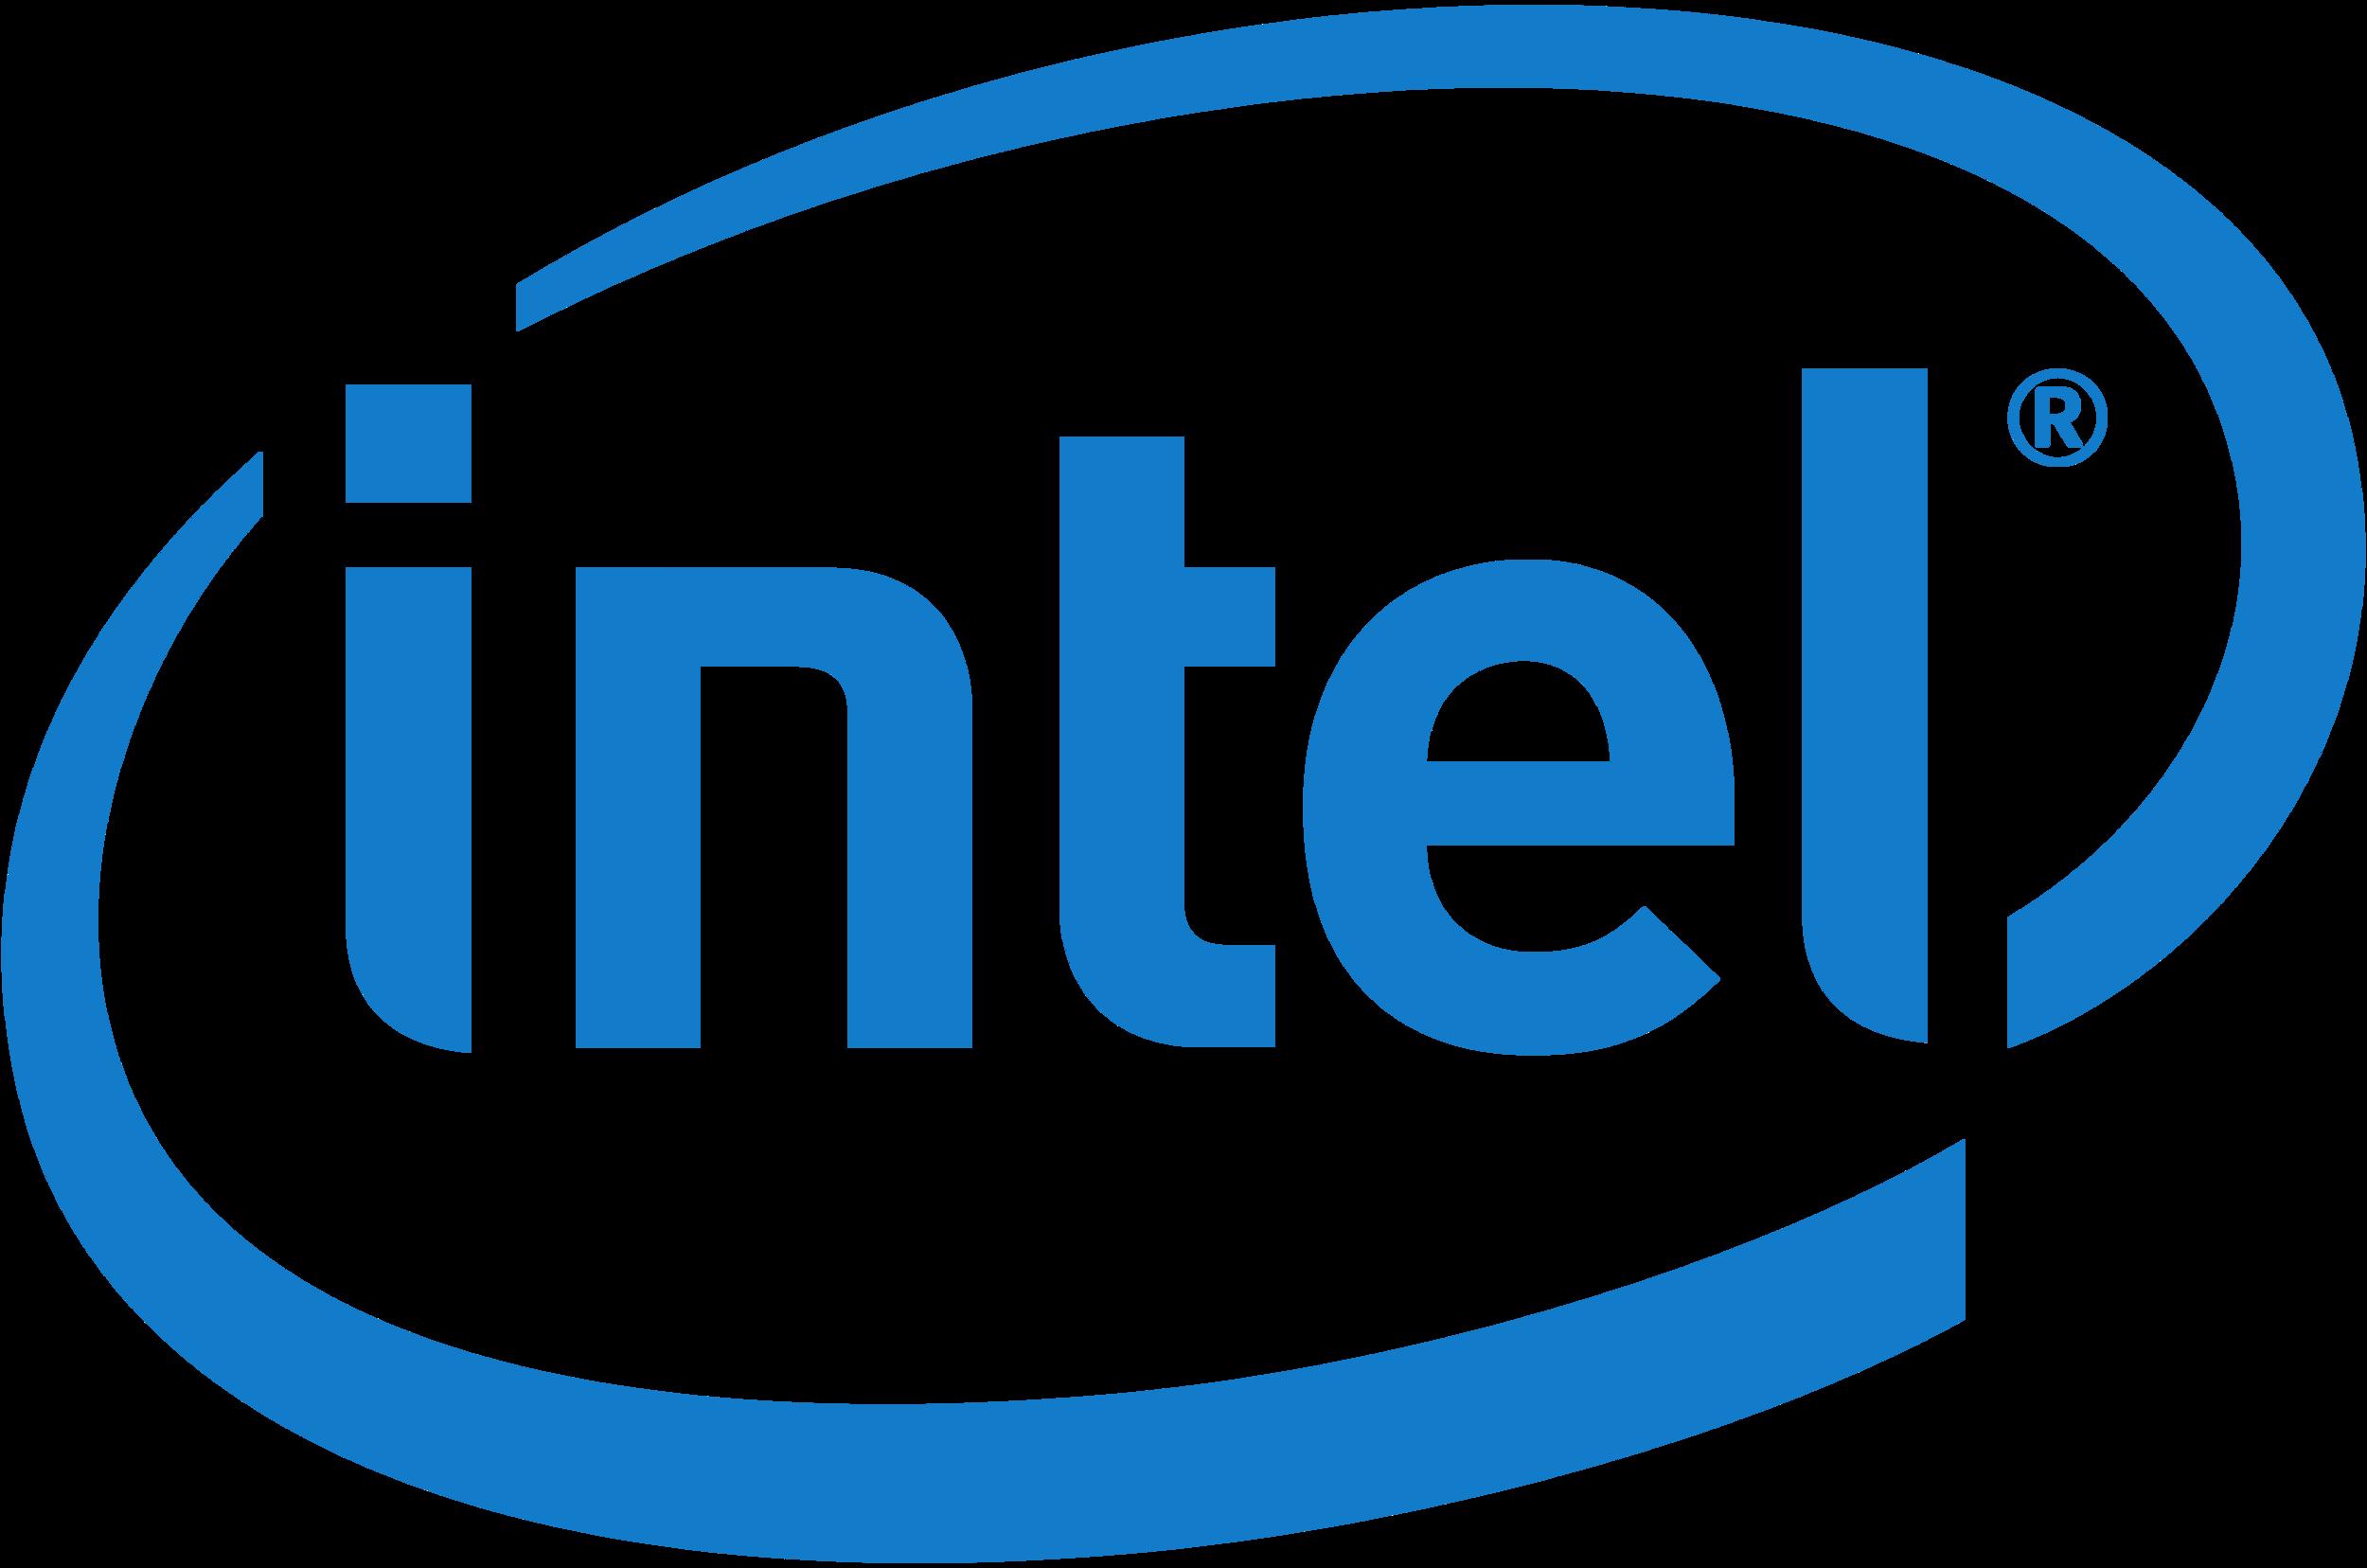 A_Intel_logo_png_transparent_huge.png